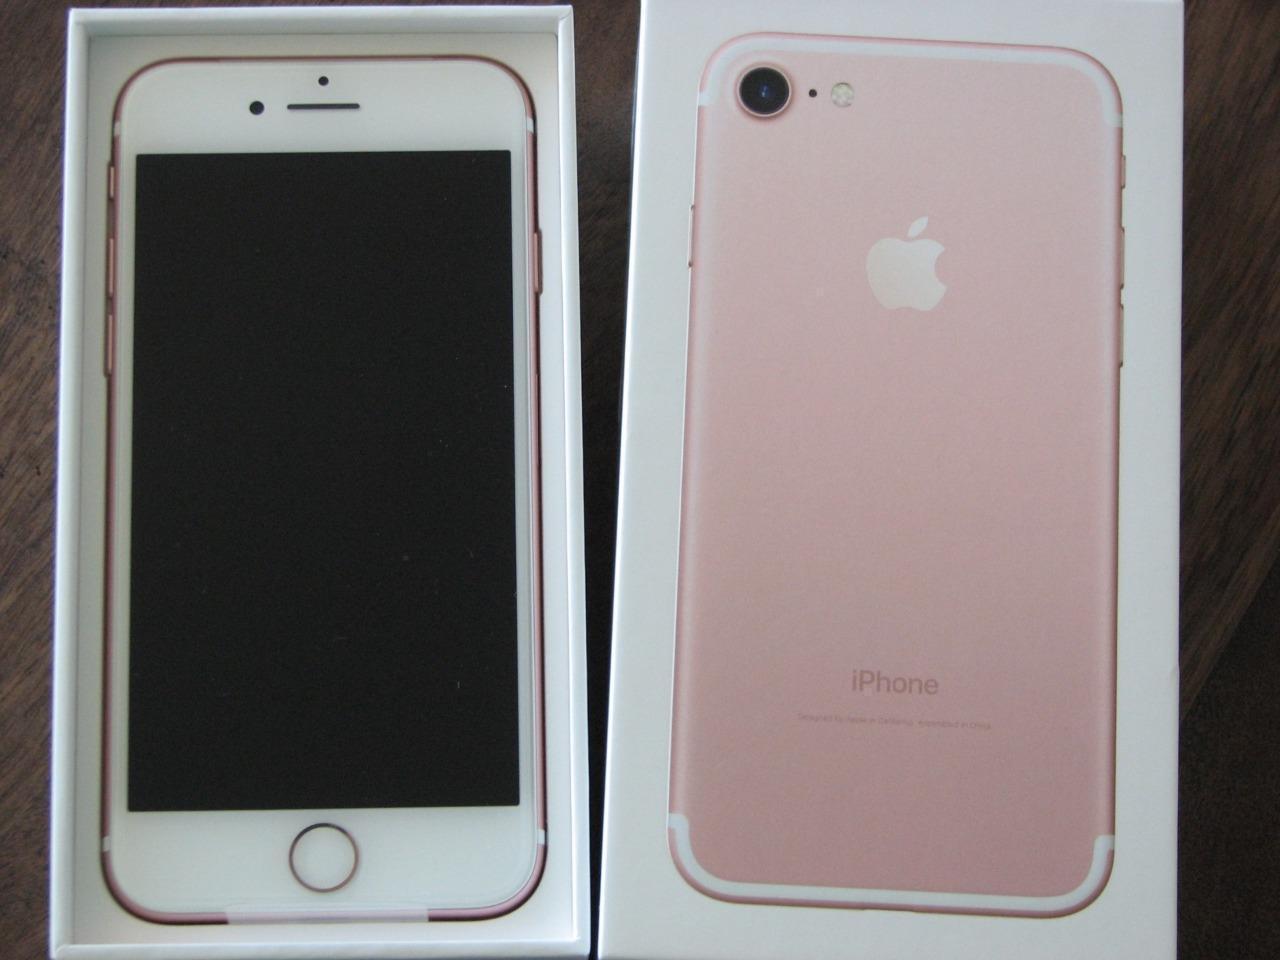 iphone 7 rose gold box. whatsapp number. +13237947106. skype: johnny.taylor01. e-mail: johnytaylor1980@gmail.com. apple iphone 7 128gb (rose gold) iphone rose gold box c